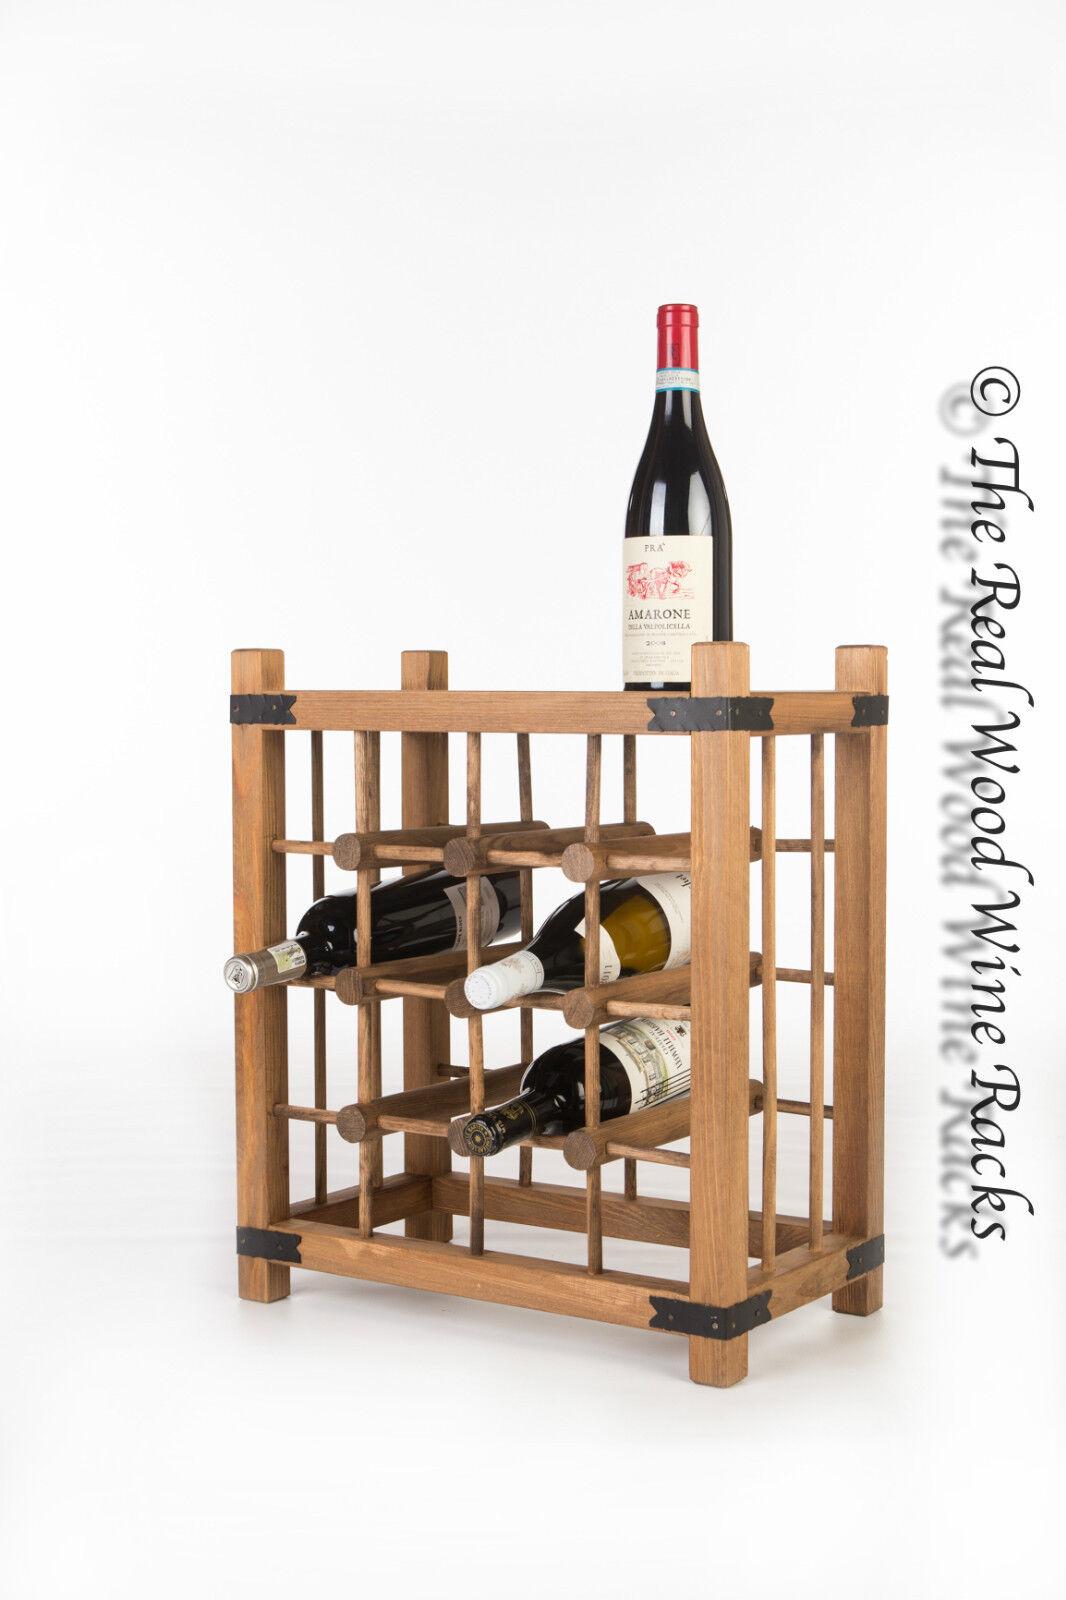 New Real Wooden Rustic Wine Rack Cabinet 16 Bottles